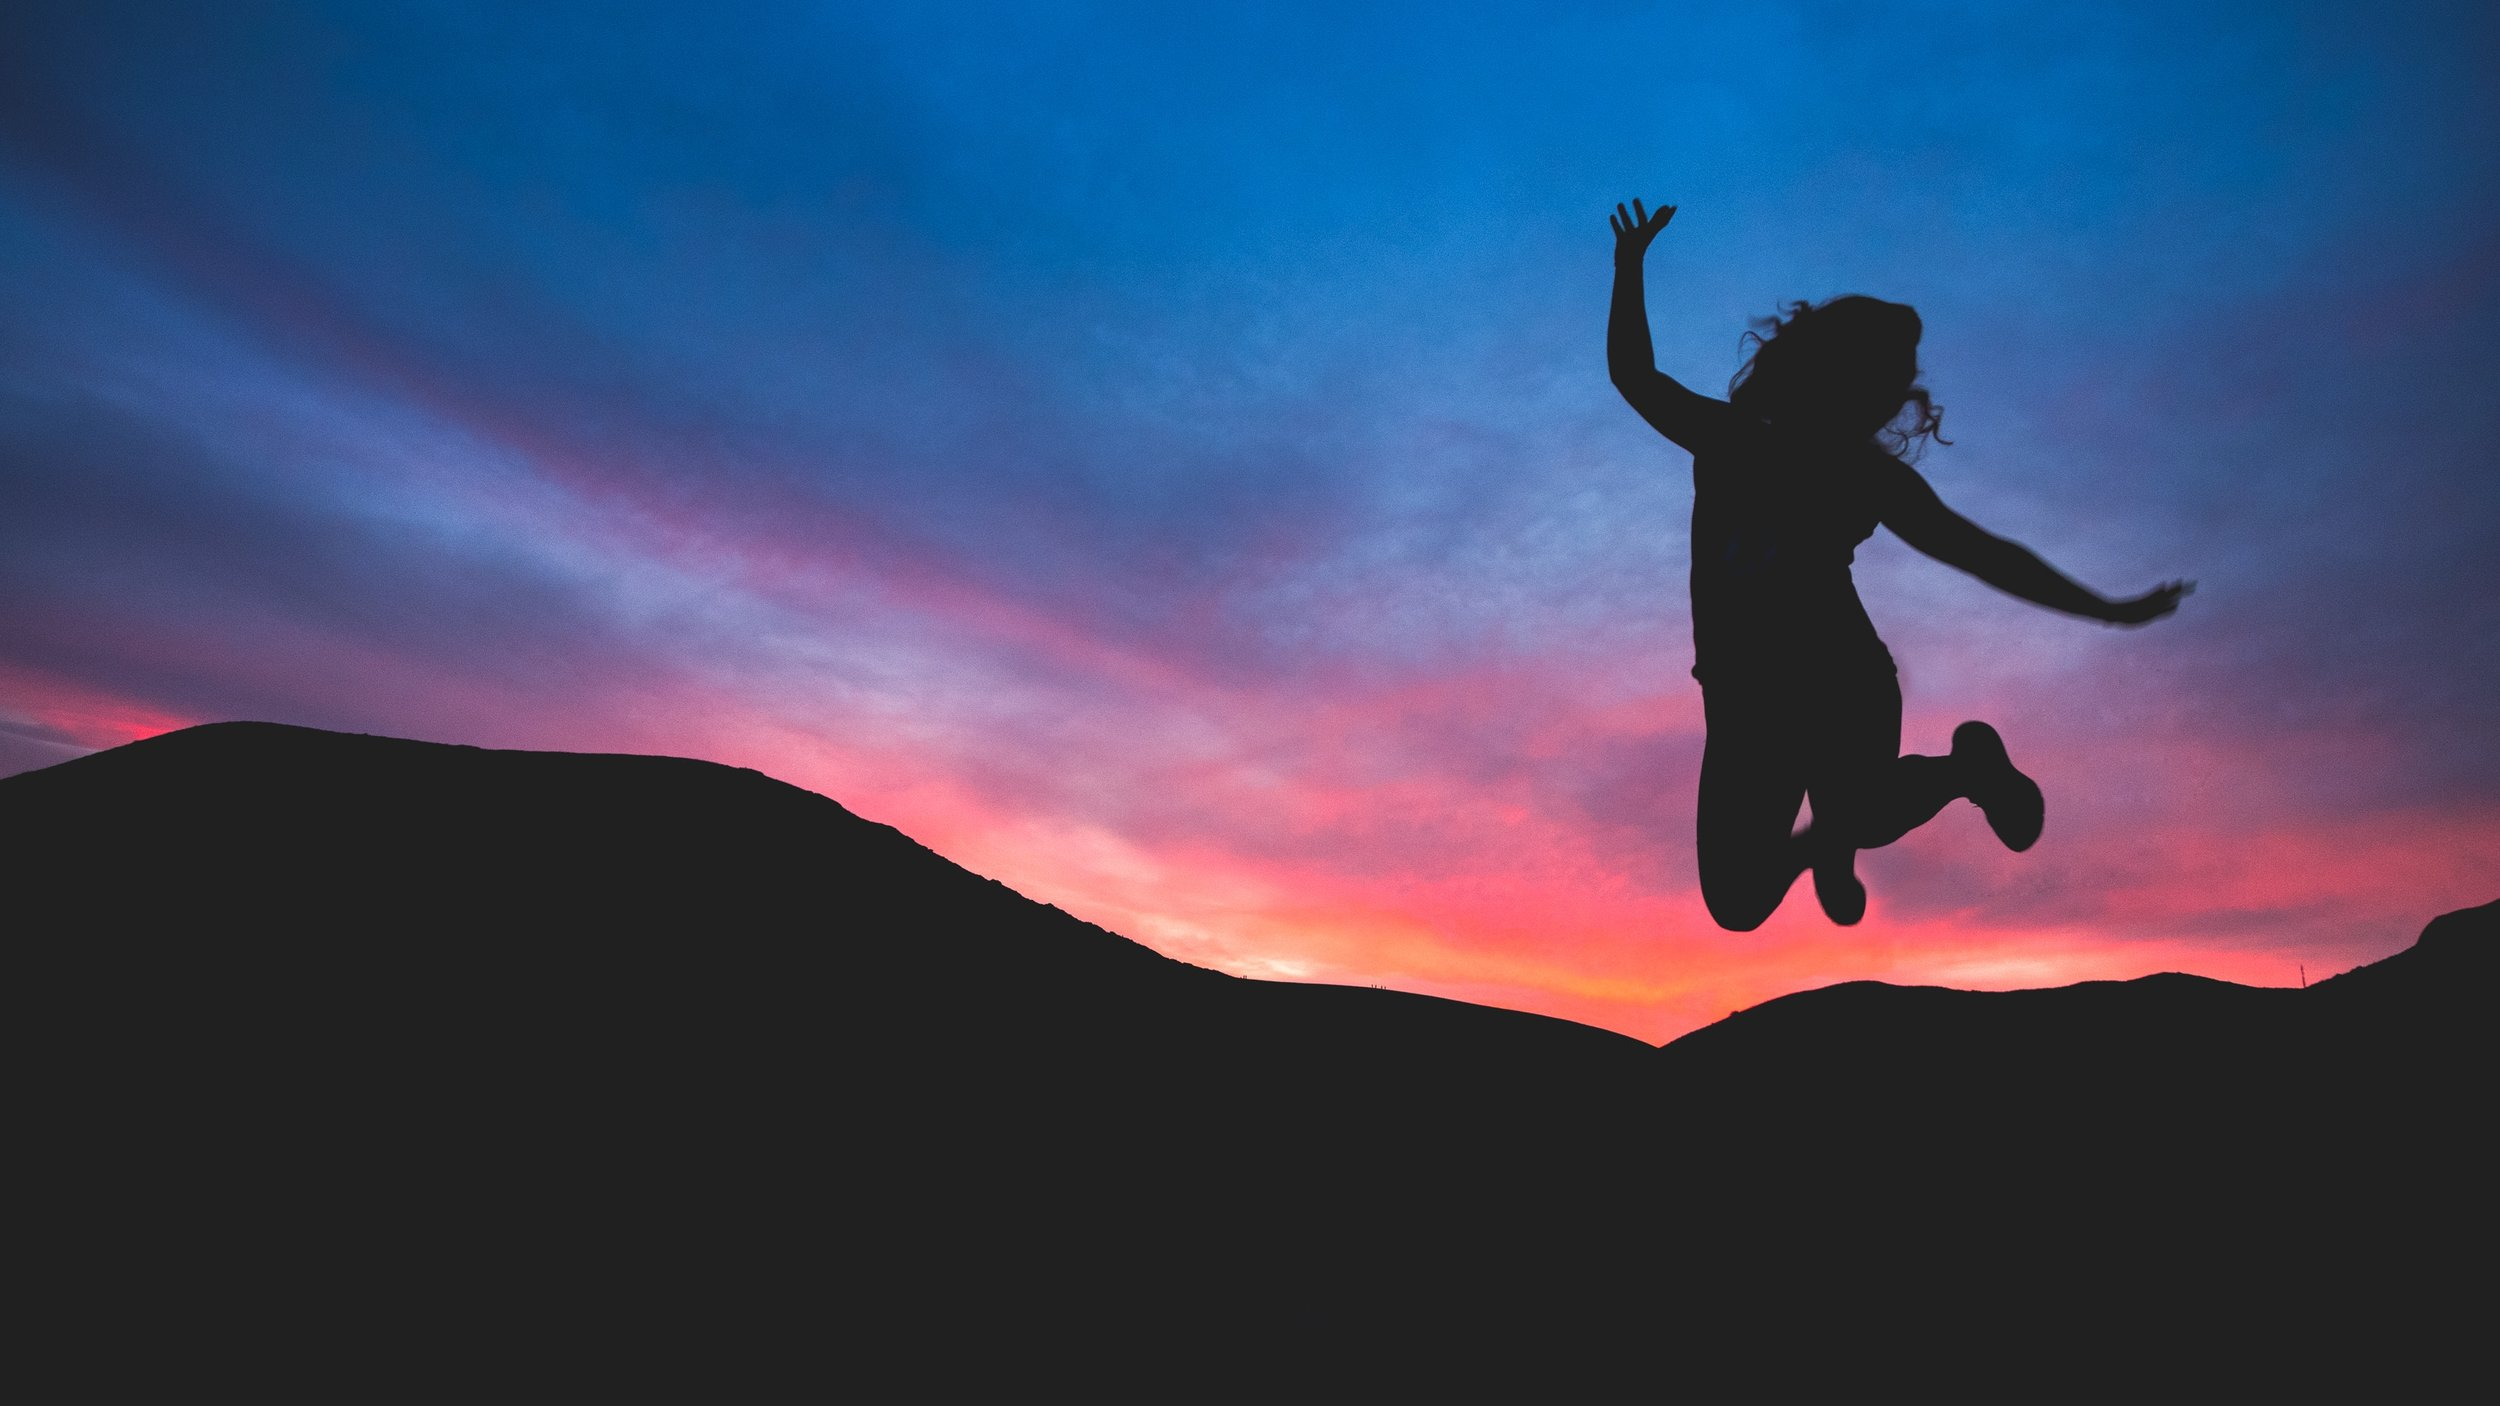 Joy and purpose